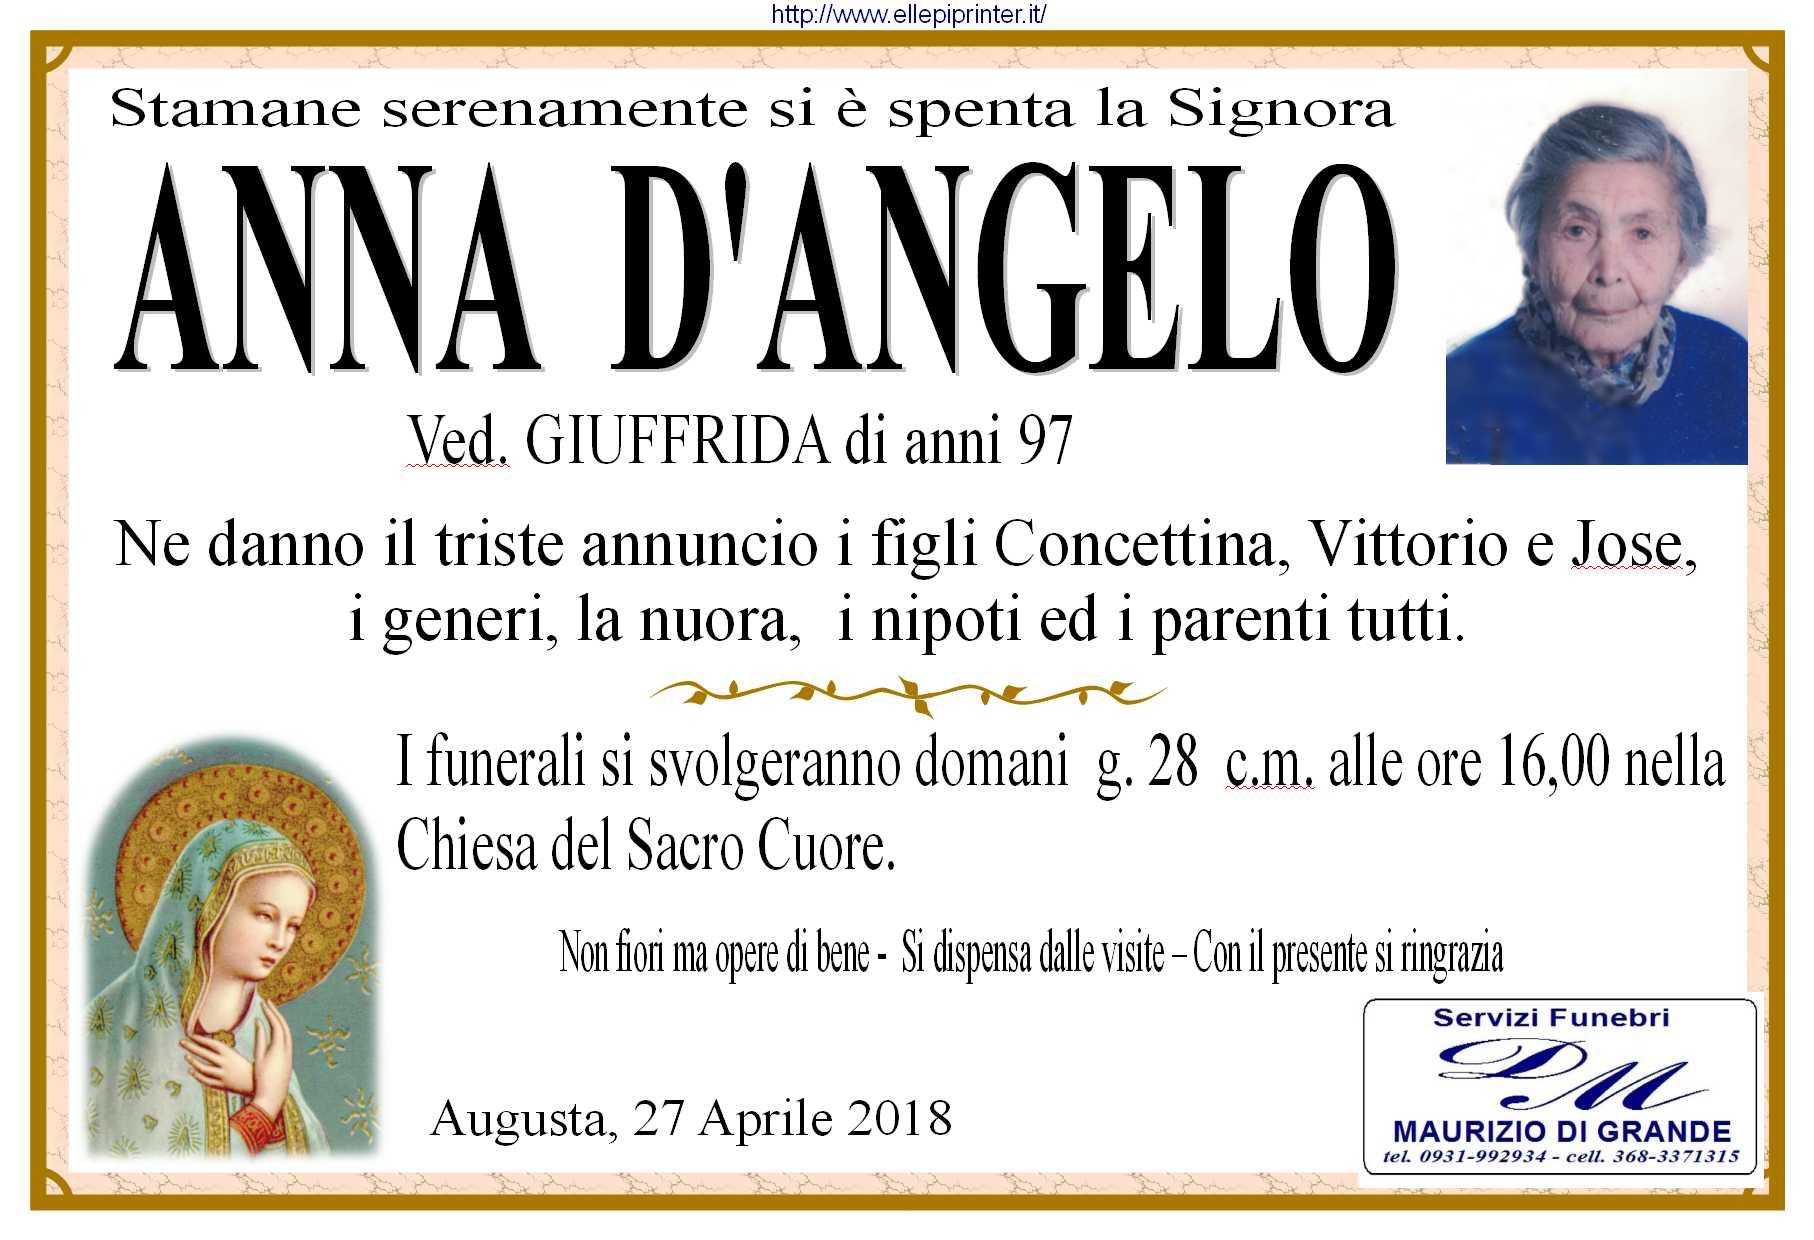 D'Angelo  Anna man